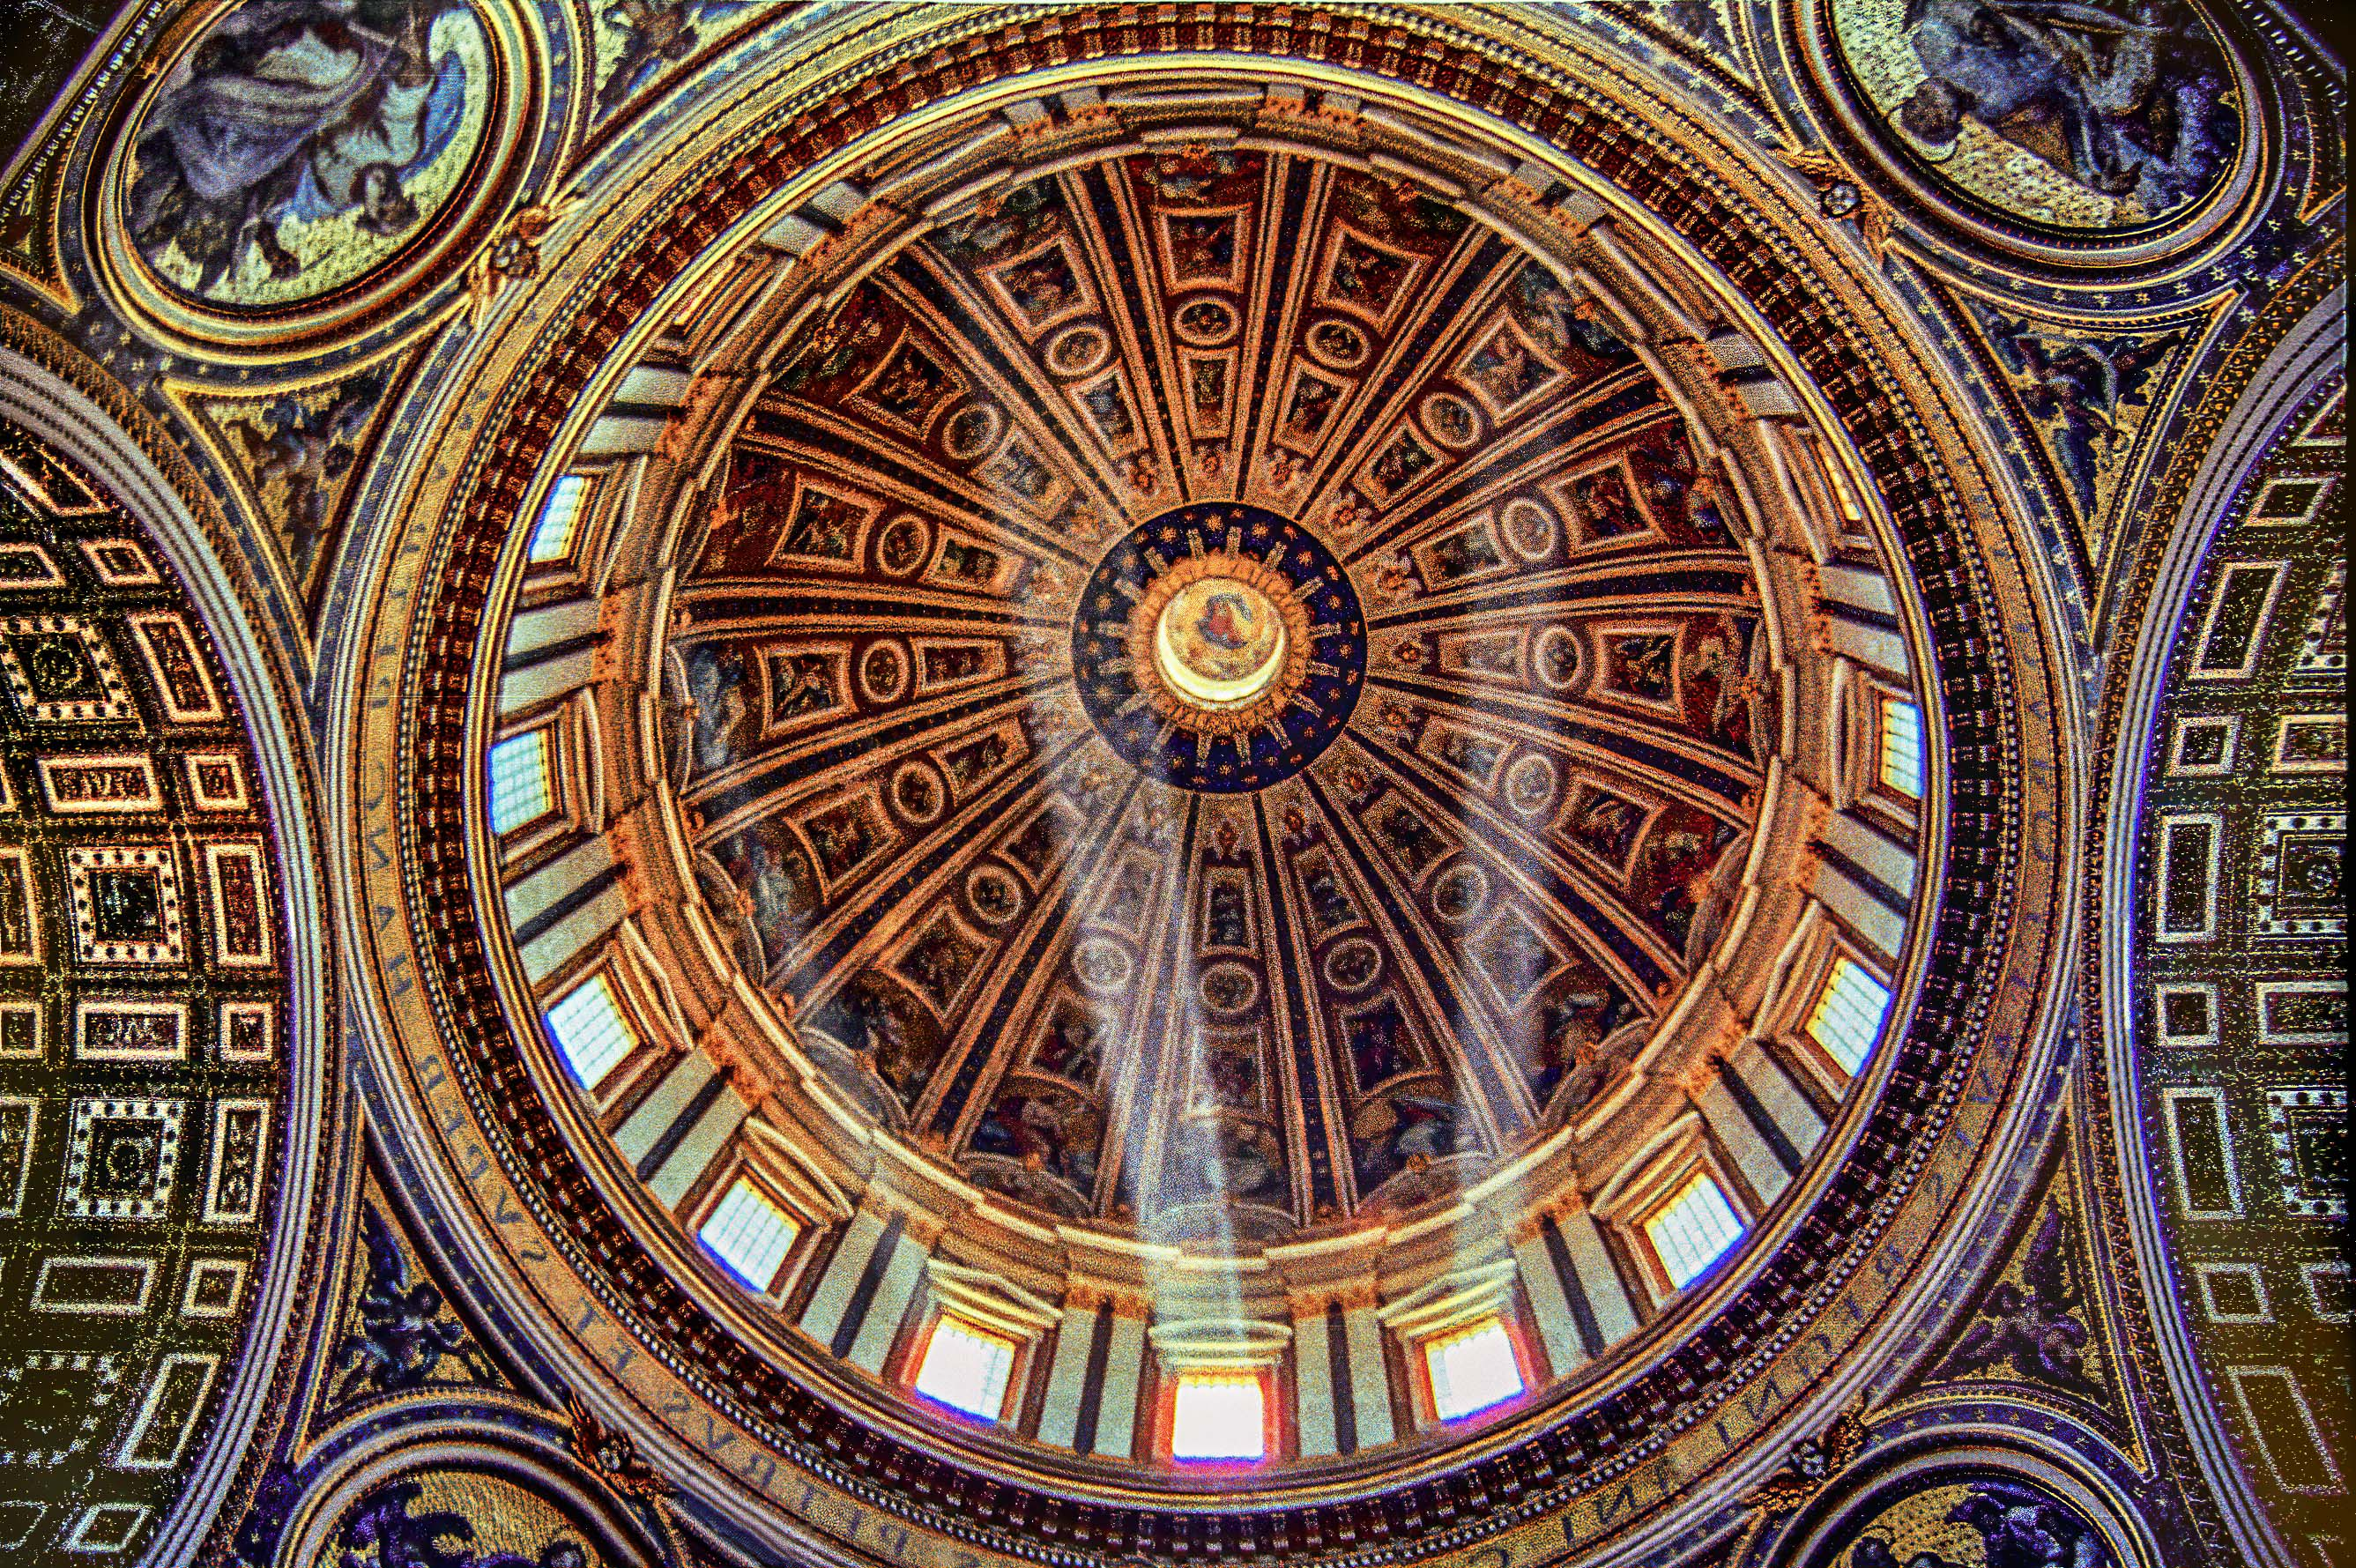 Vatican - St